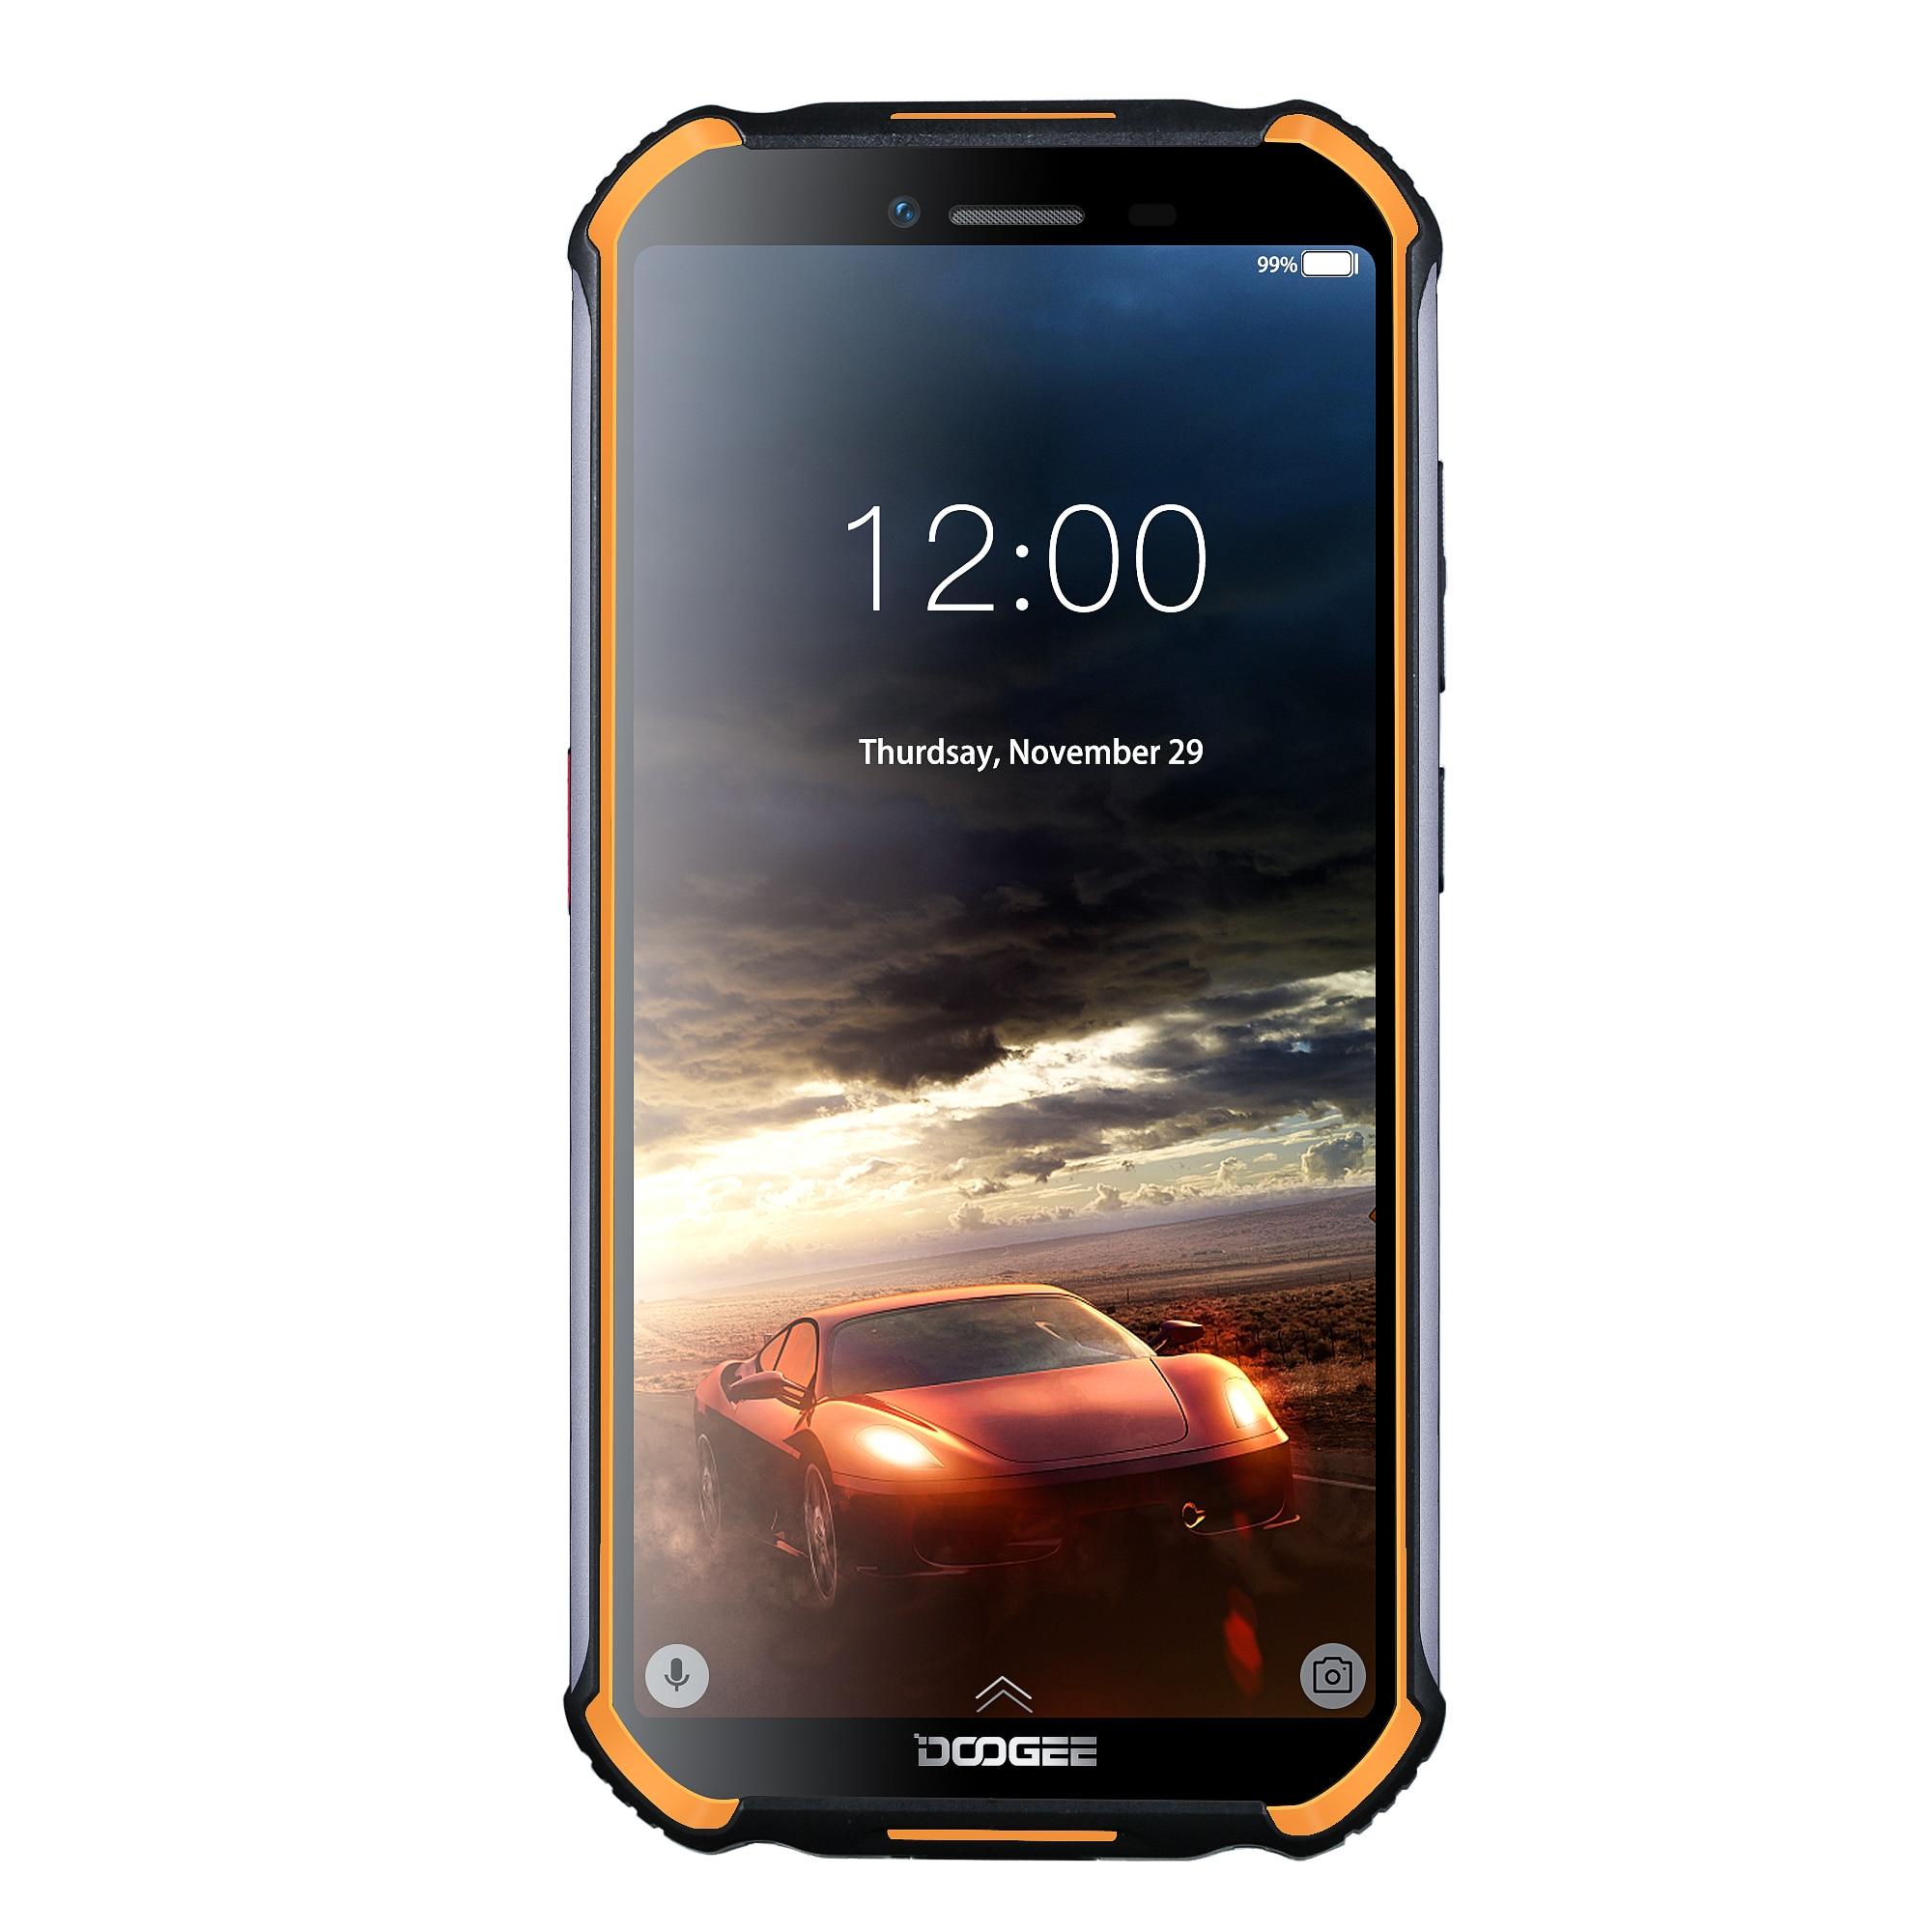 Смартфон DOOGEE S40 на Android 9,0, 4-ядерный процессор MT6739, экран 5,5 дюйма, 3 ГБ + 32 ГБ